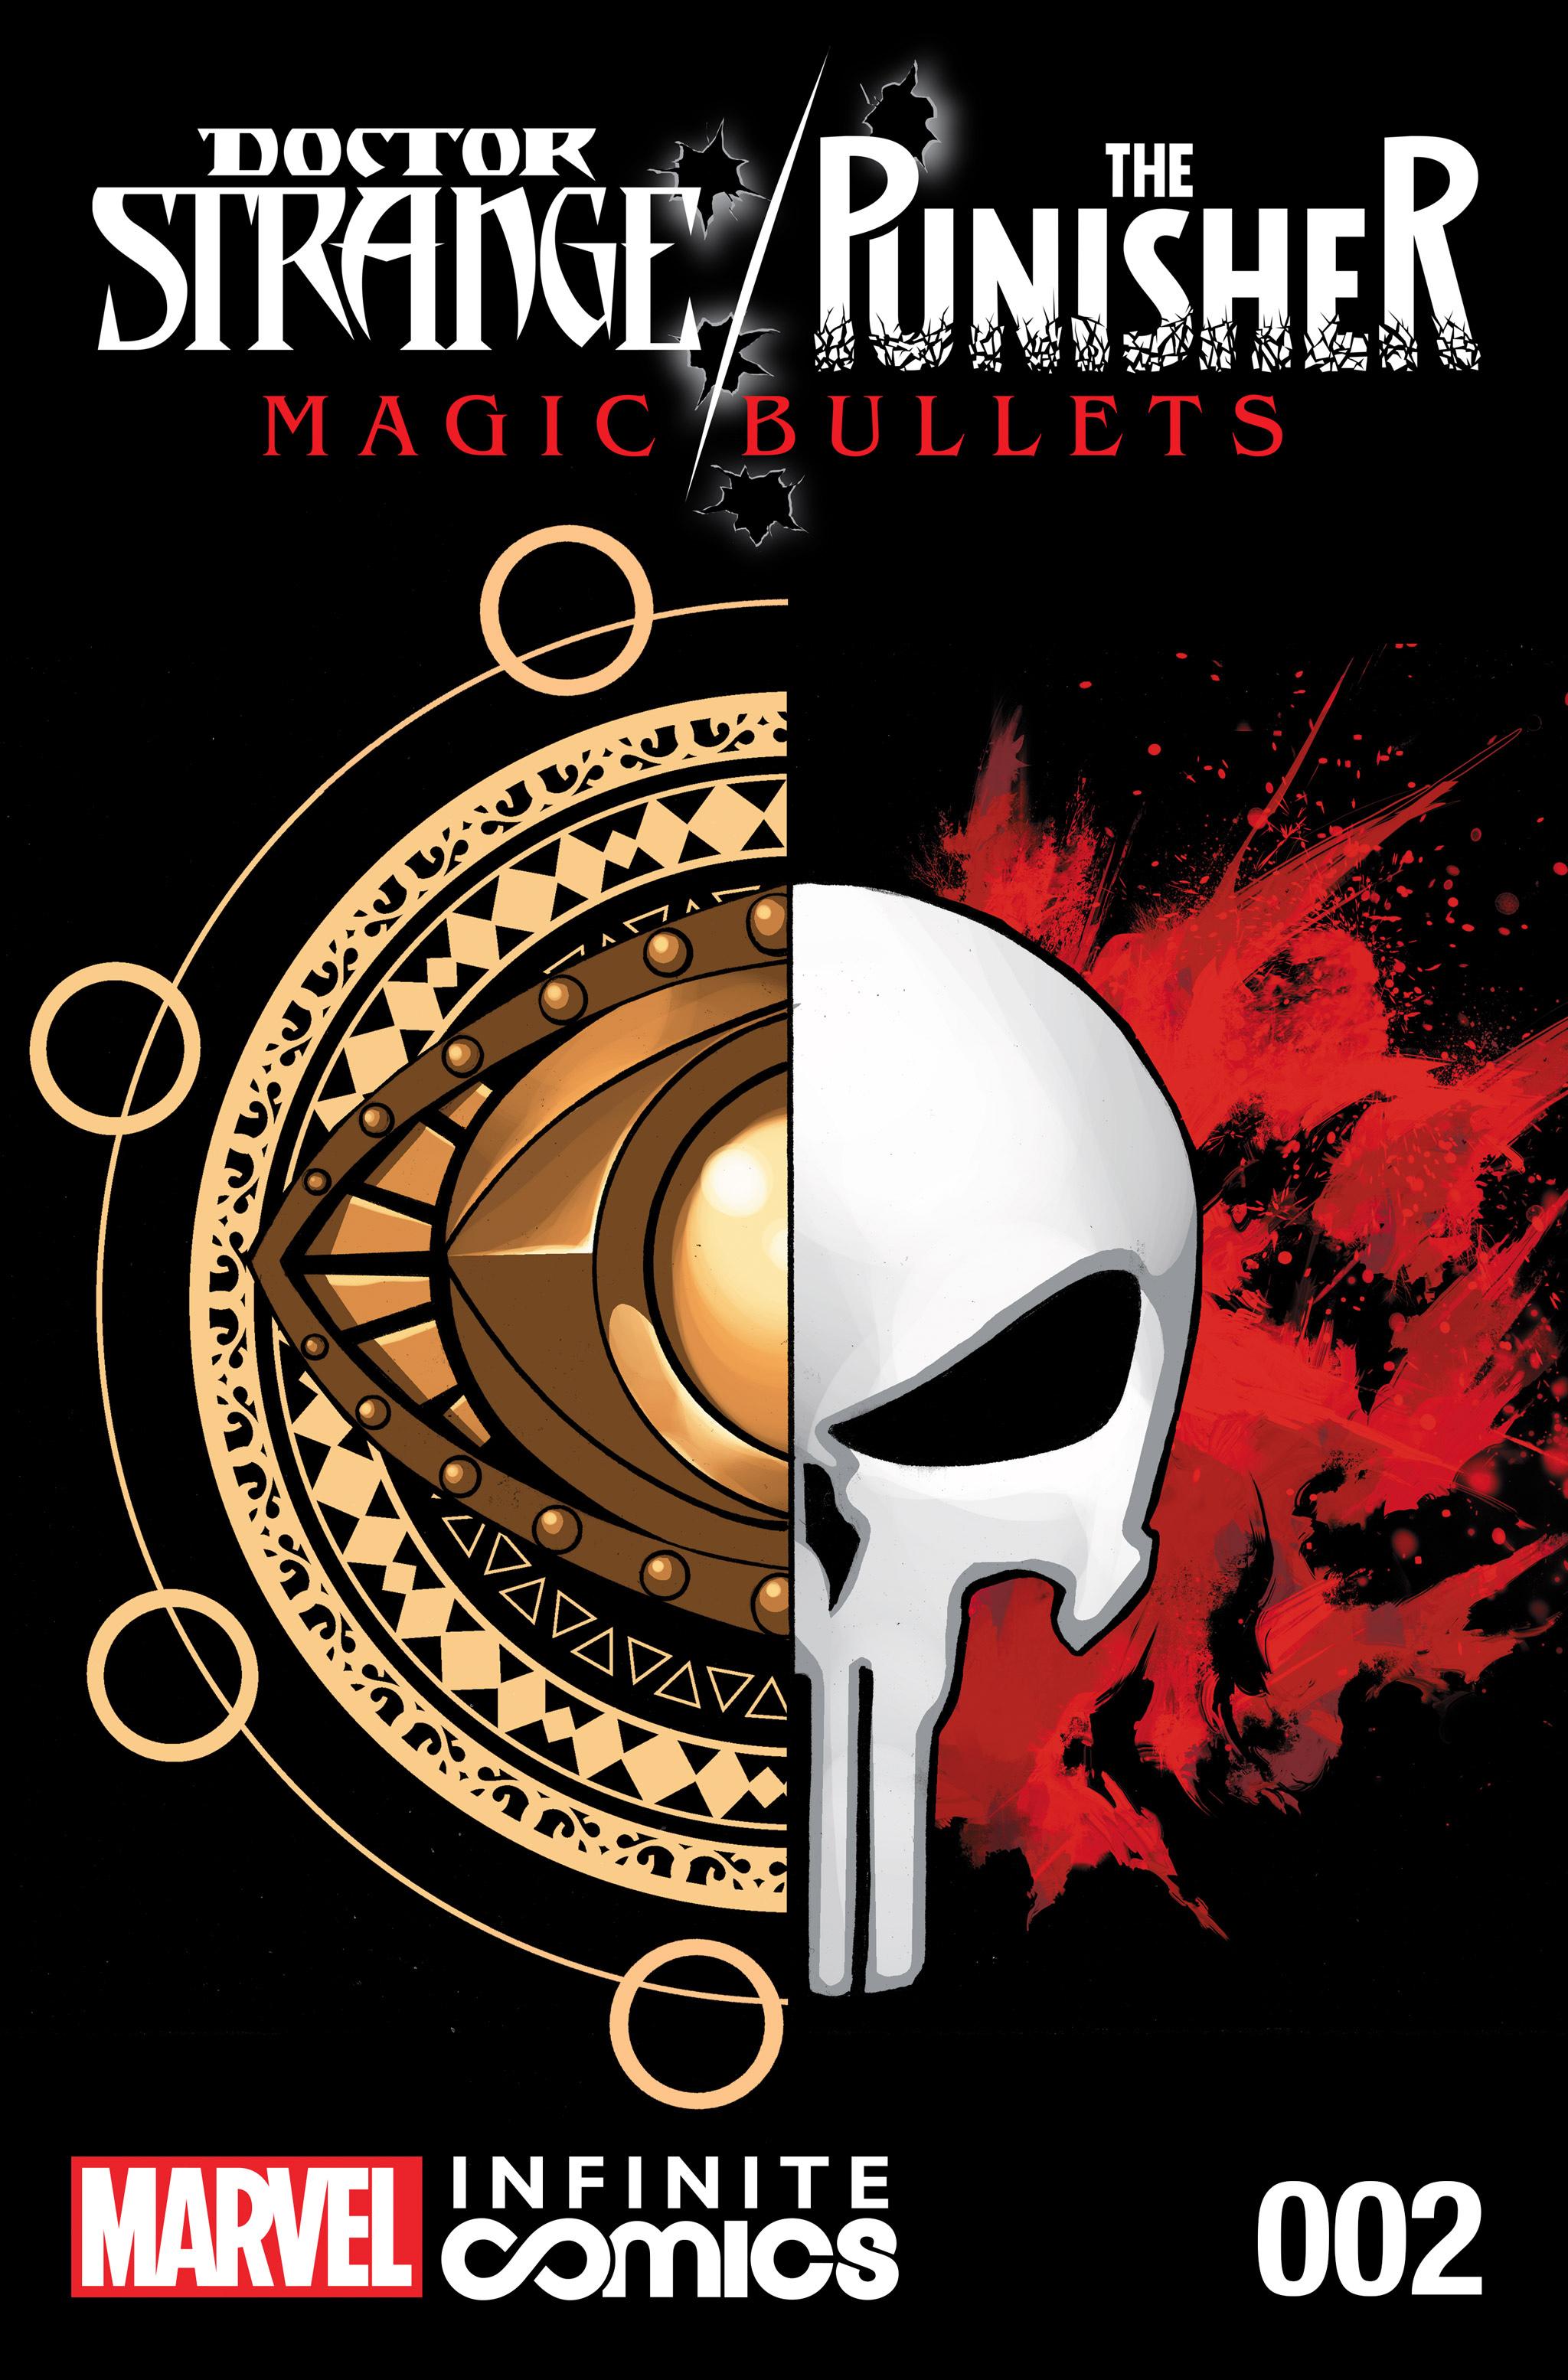 Doctor Strange/Punisher: Magic Bullets Infinite Comic 2 Page 1